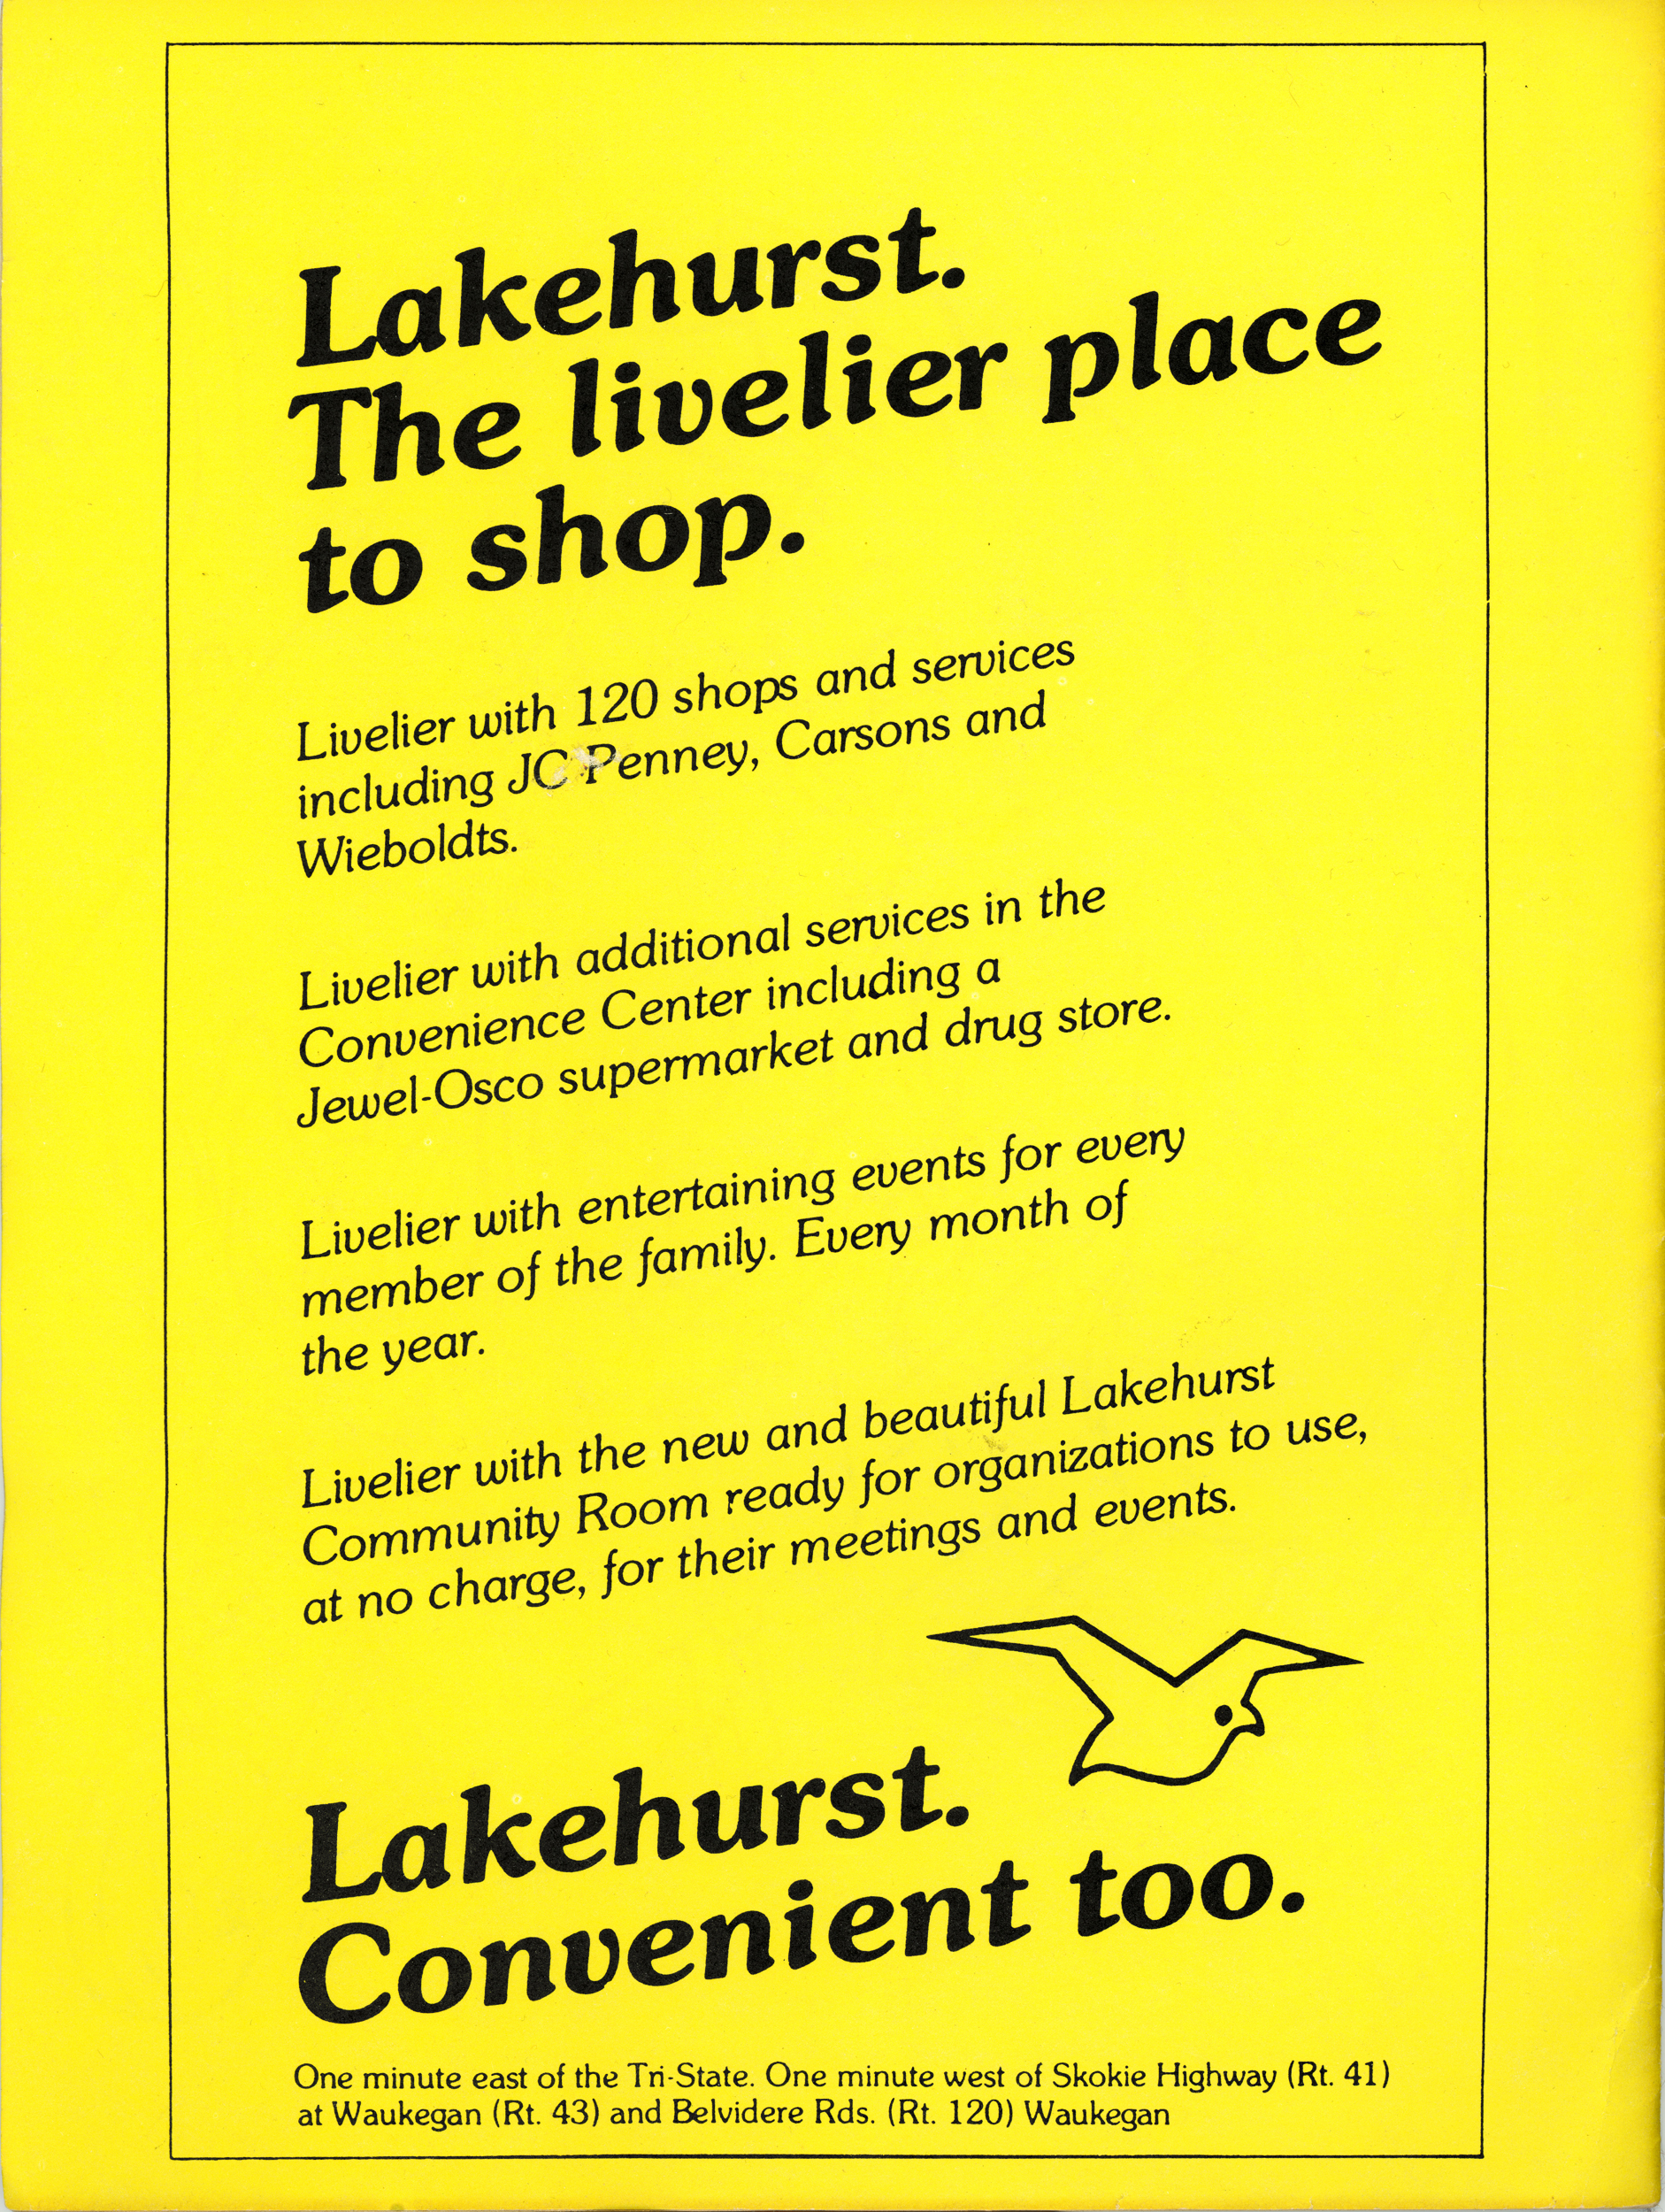 Lakehurst promo